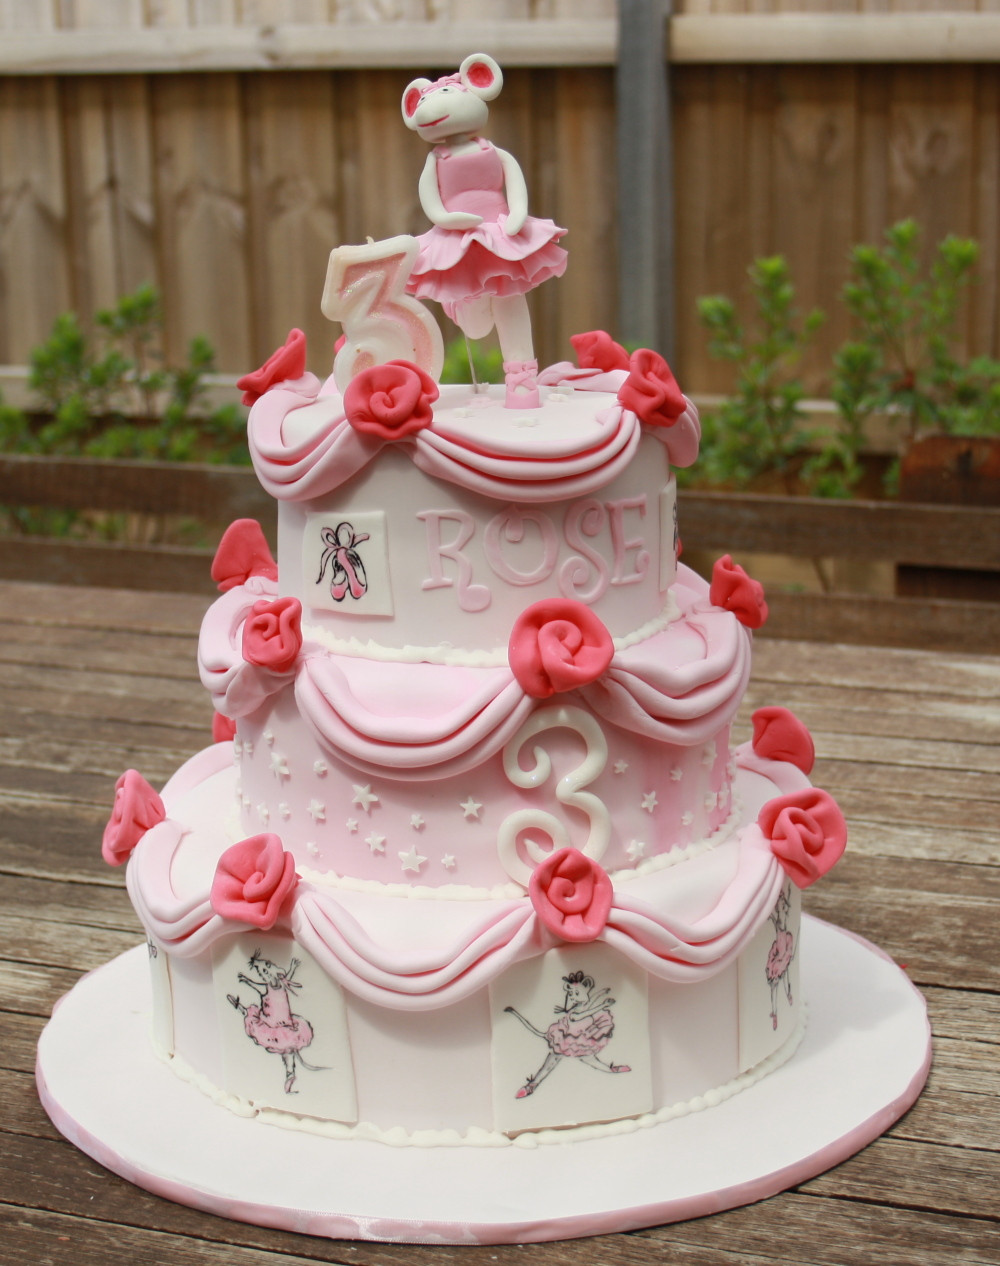 Best ideas about Cake Birthday . Save or Pin Birthday Cake Angelina Ballerina Cake Now.